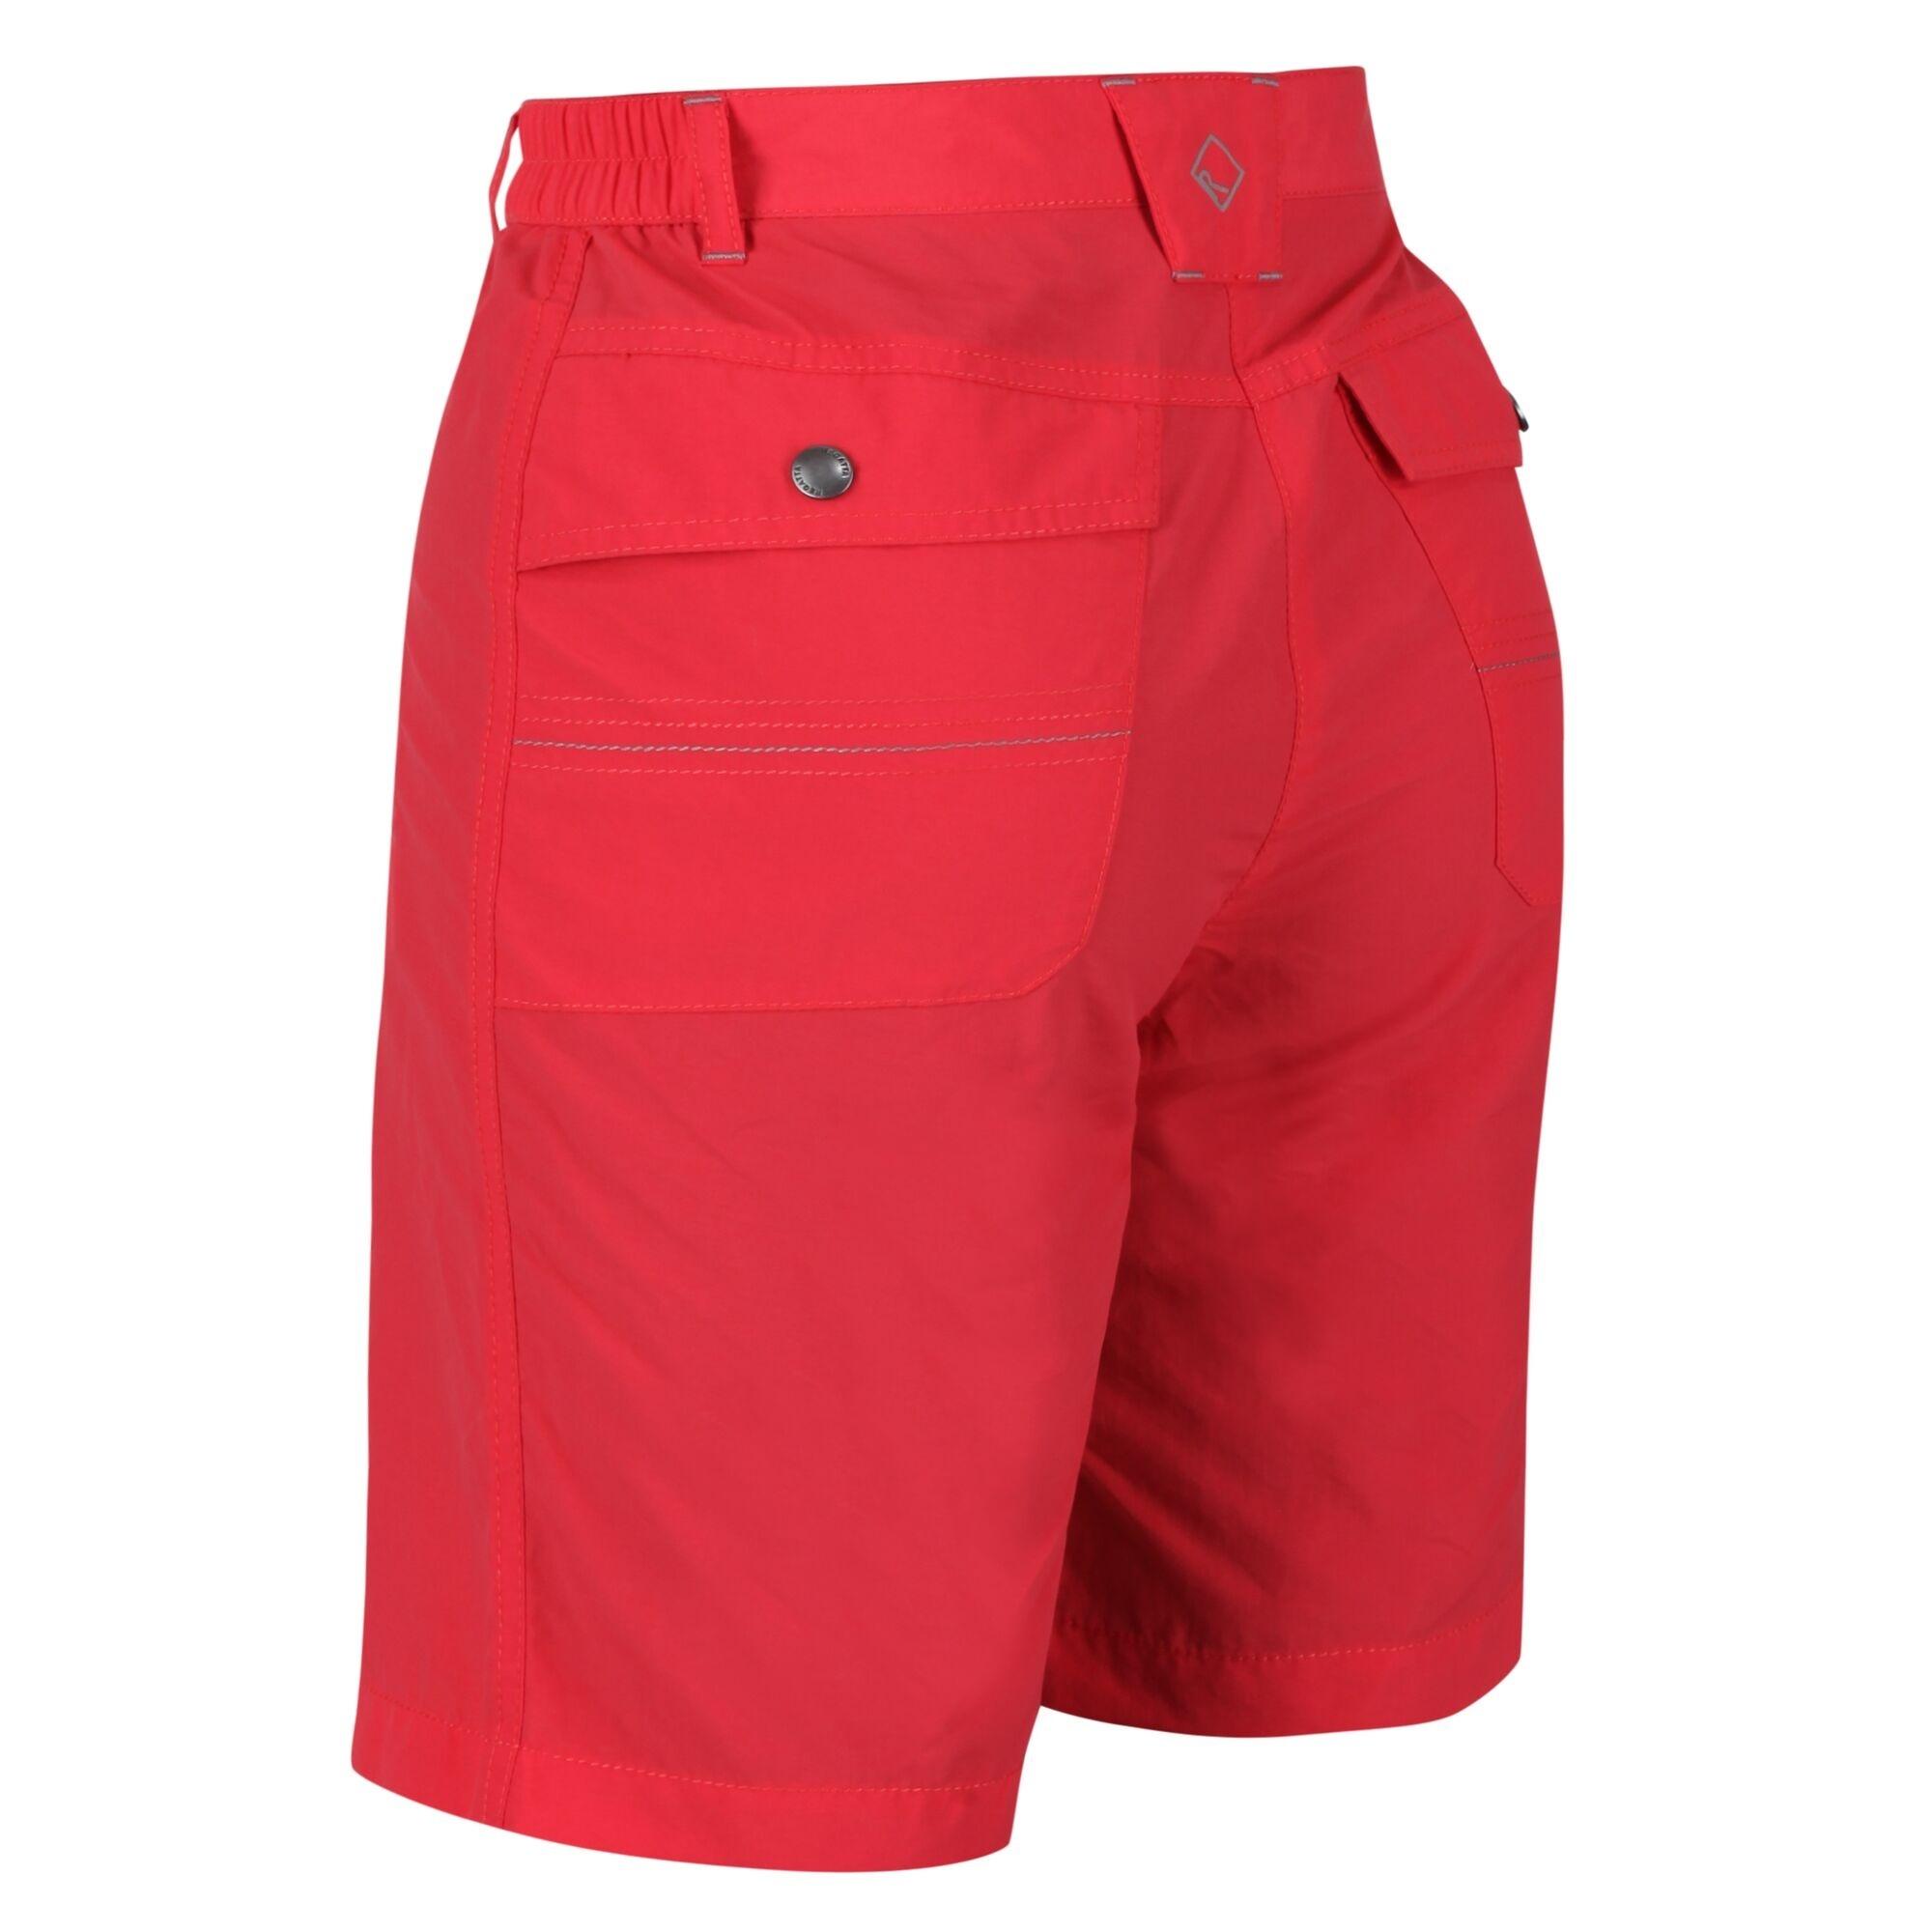 Regatta Womens/Ladies Chaska II Walking Shorts (14 UK) (Moccasin)